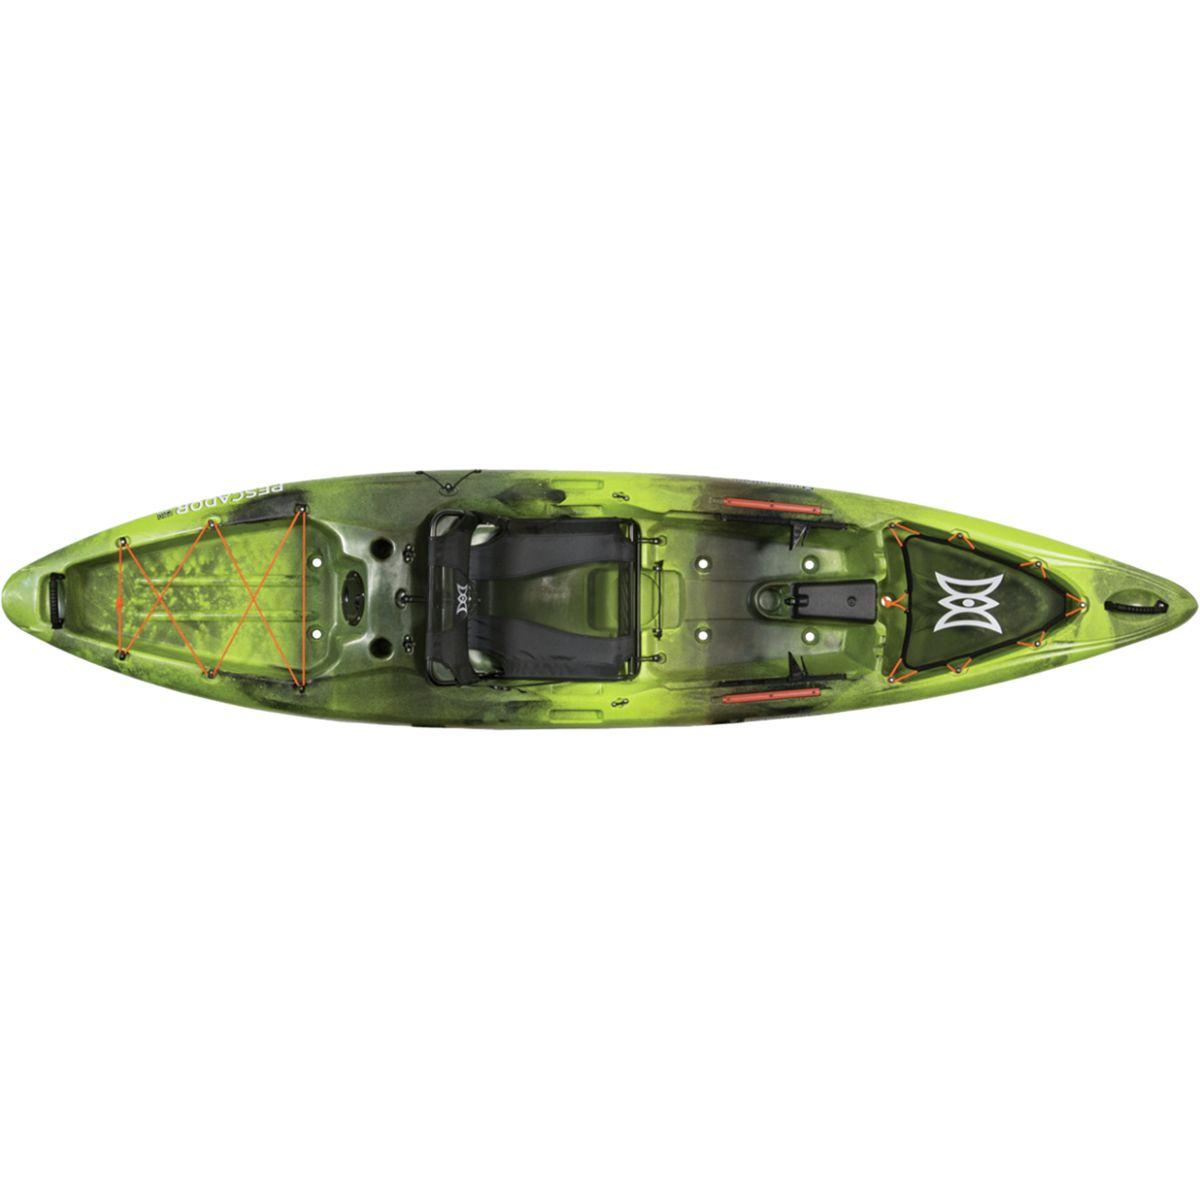 Perception Pescador Pro 12.0